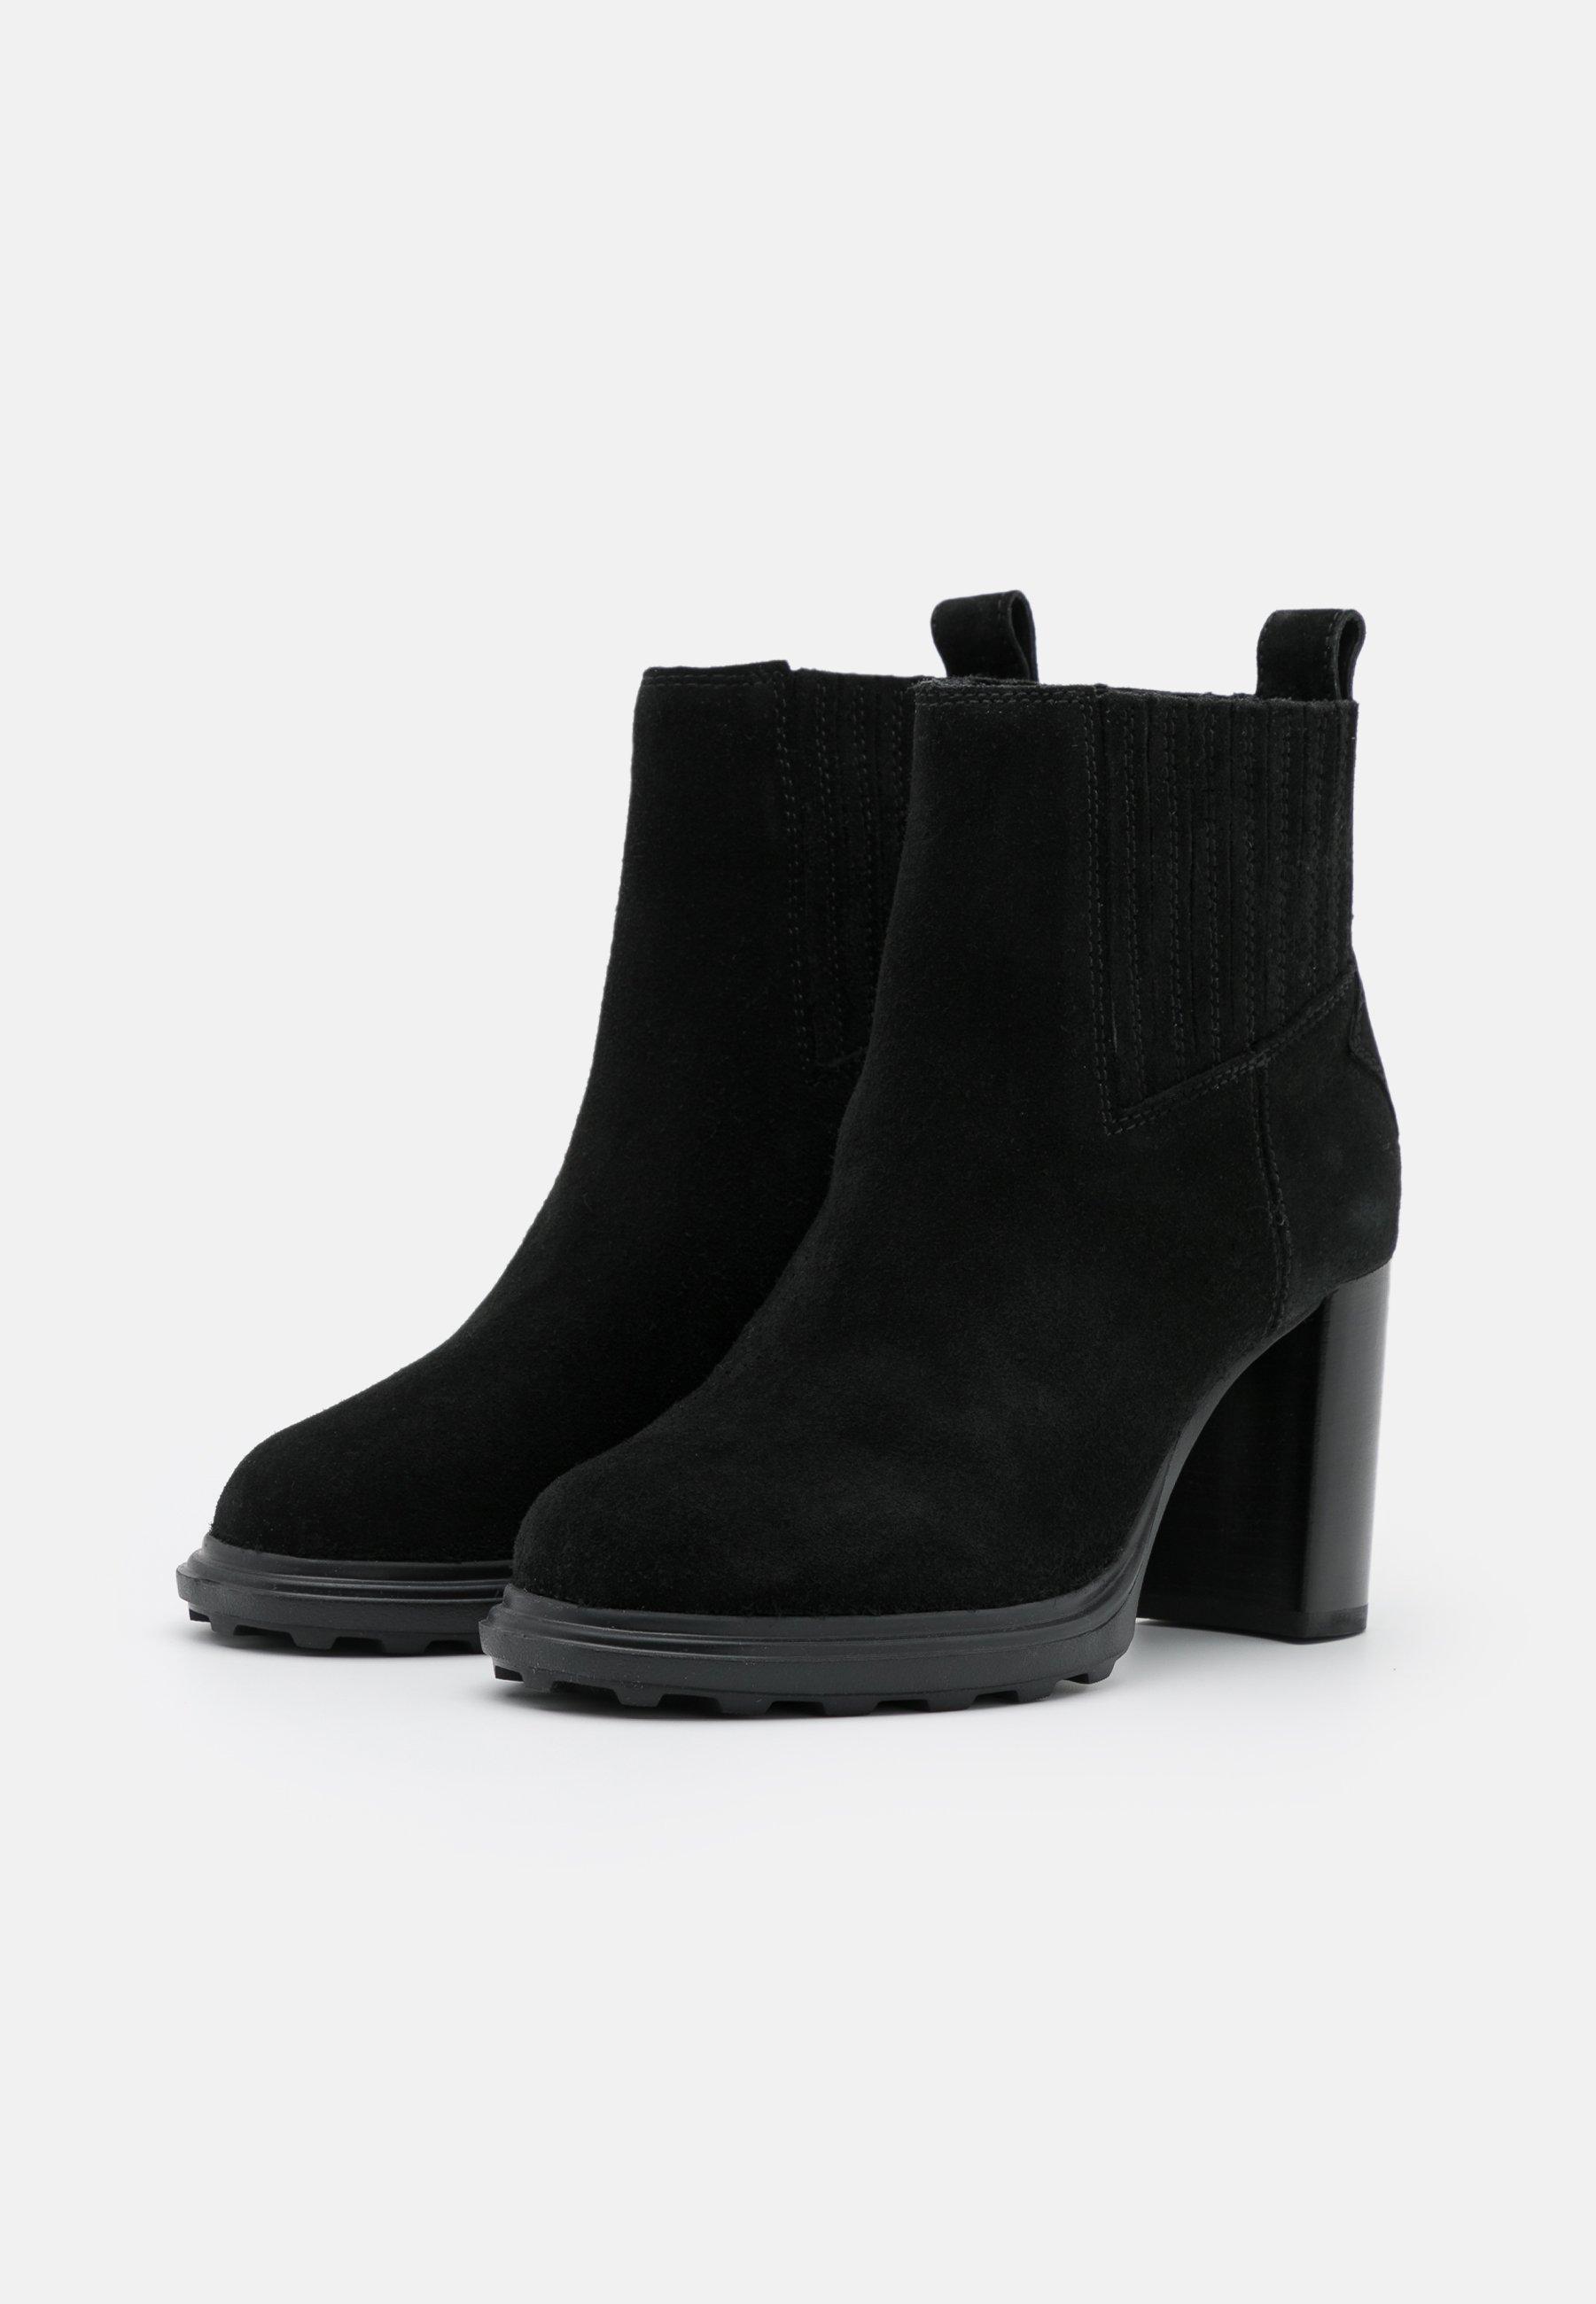 Geox SALICE HIGH Ankle Boot black/schwarz